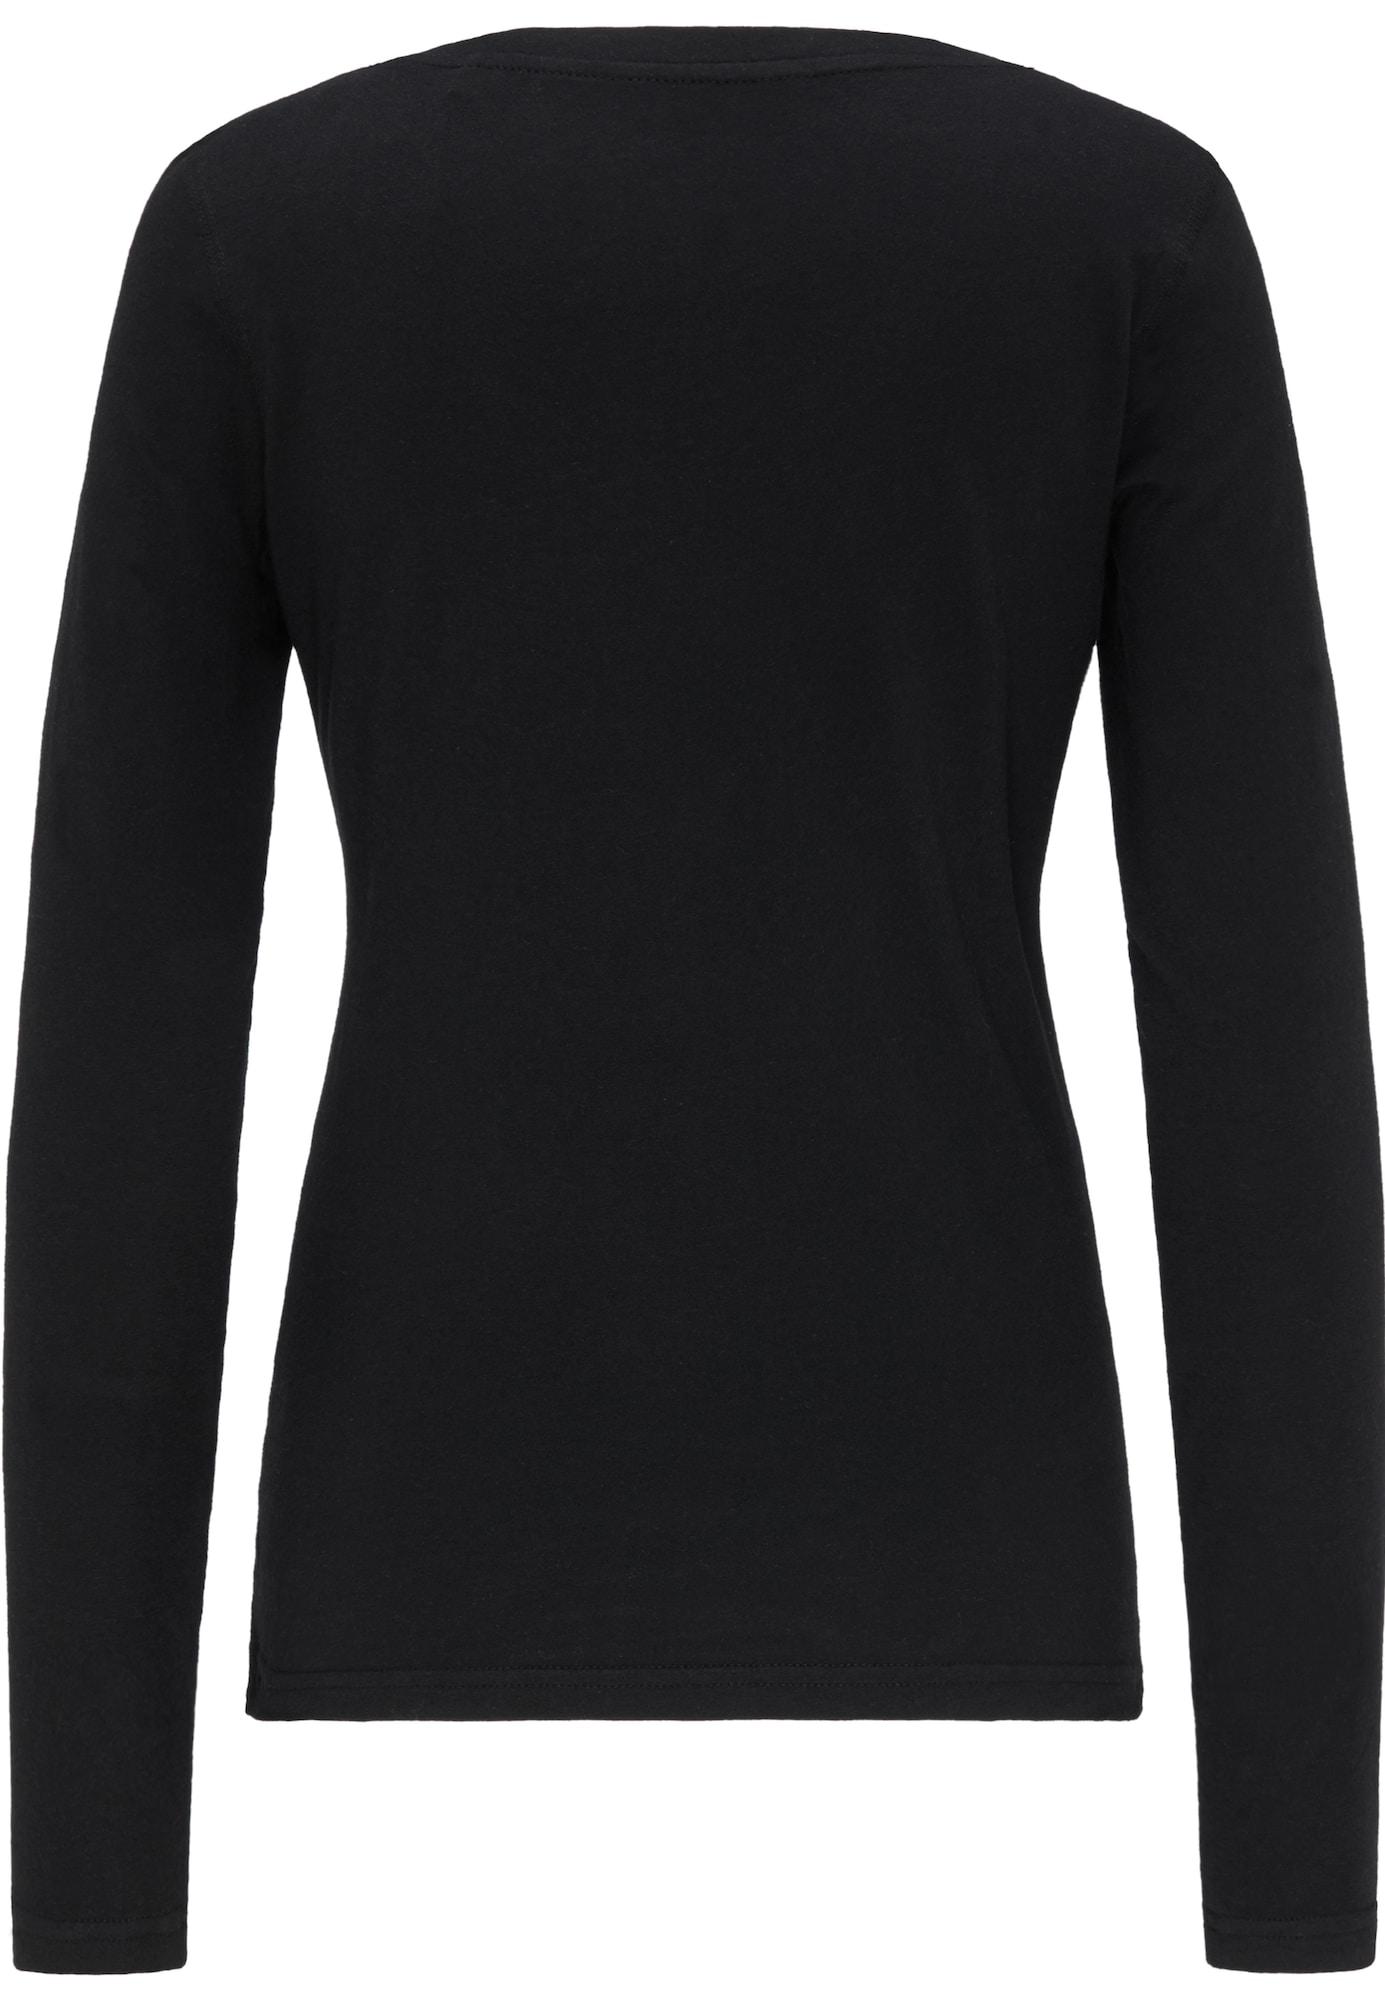 mustang - T-Shirt ' Basic-Longsleeve '